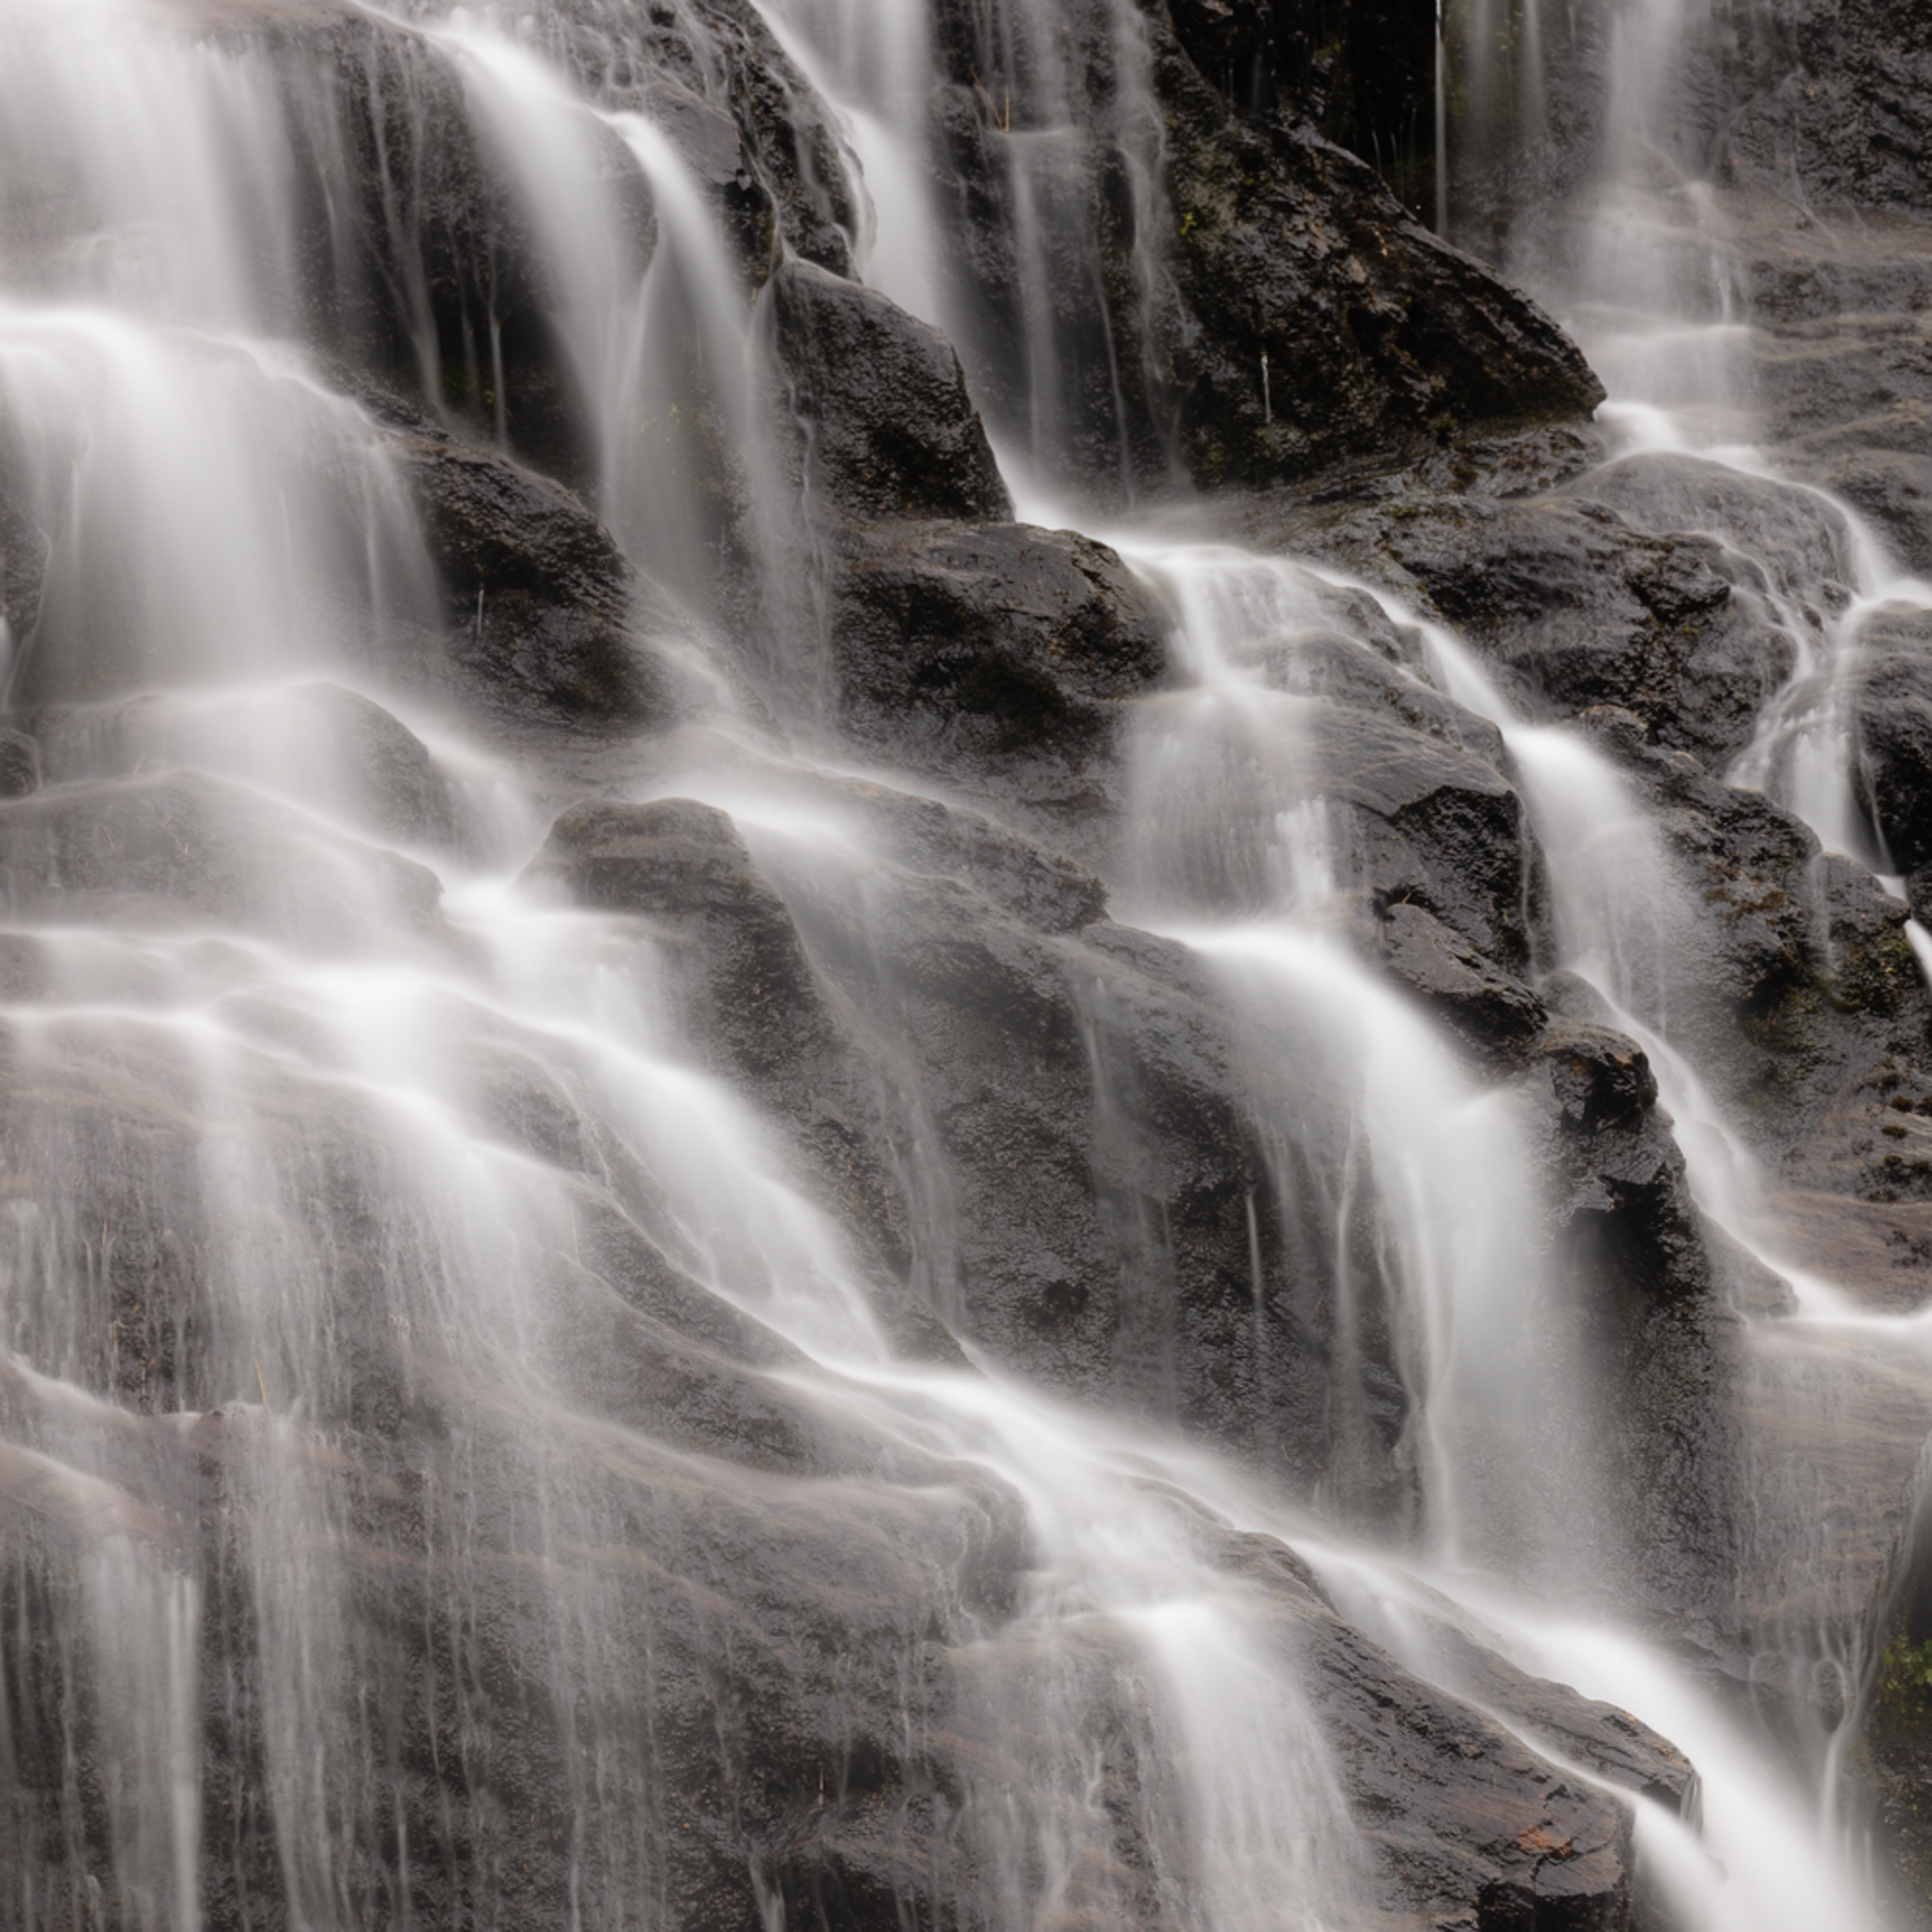 20200709 waterfall dsr1670 artstorefronts ru61fz